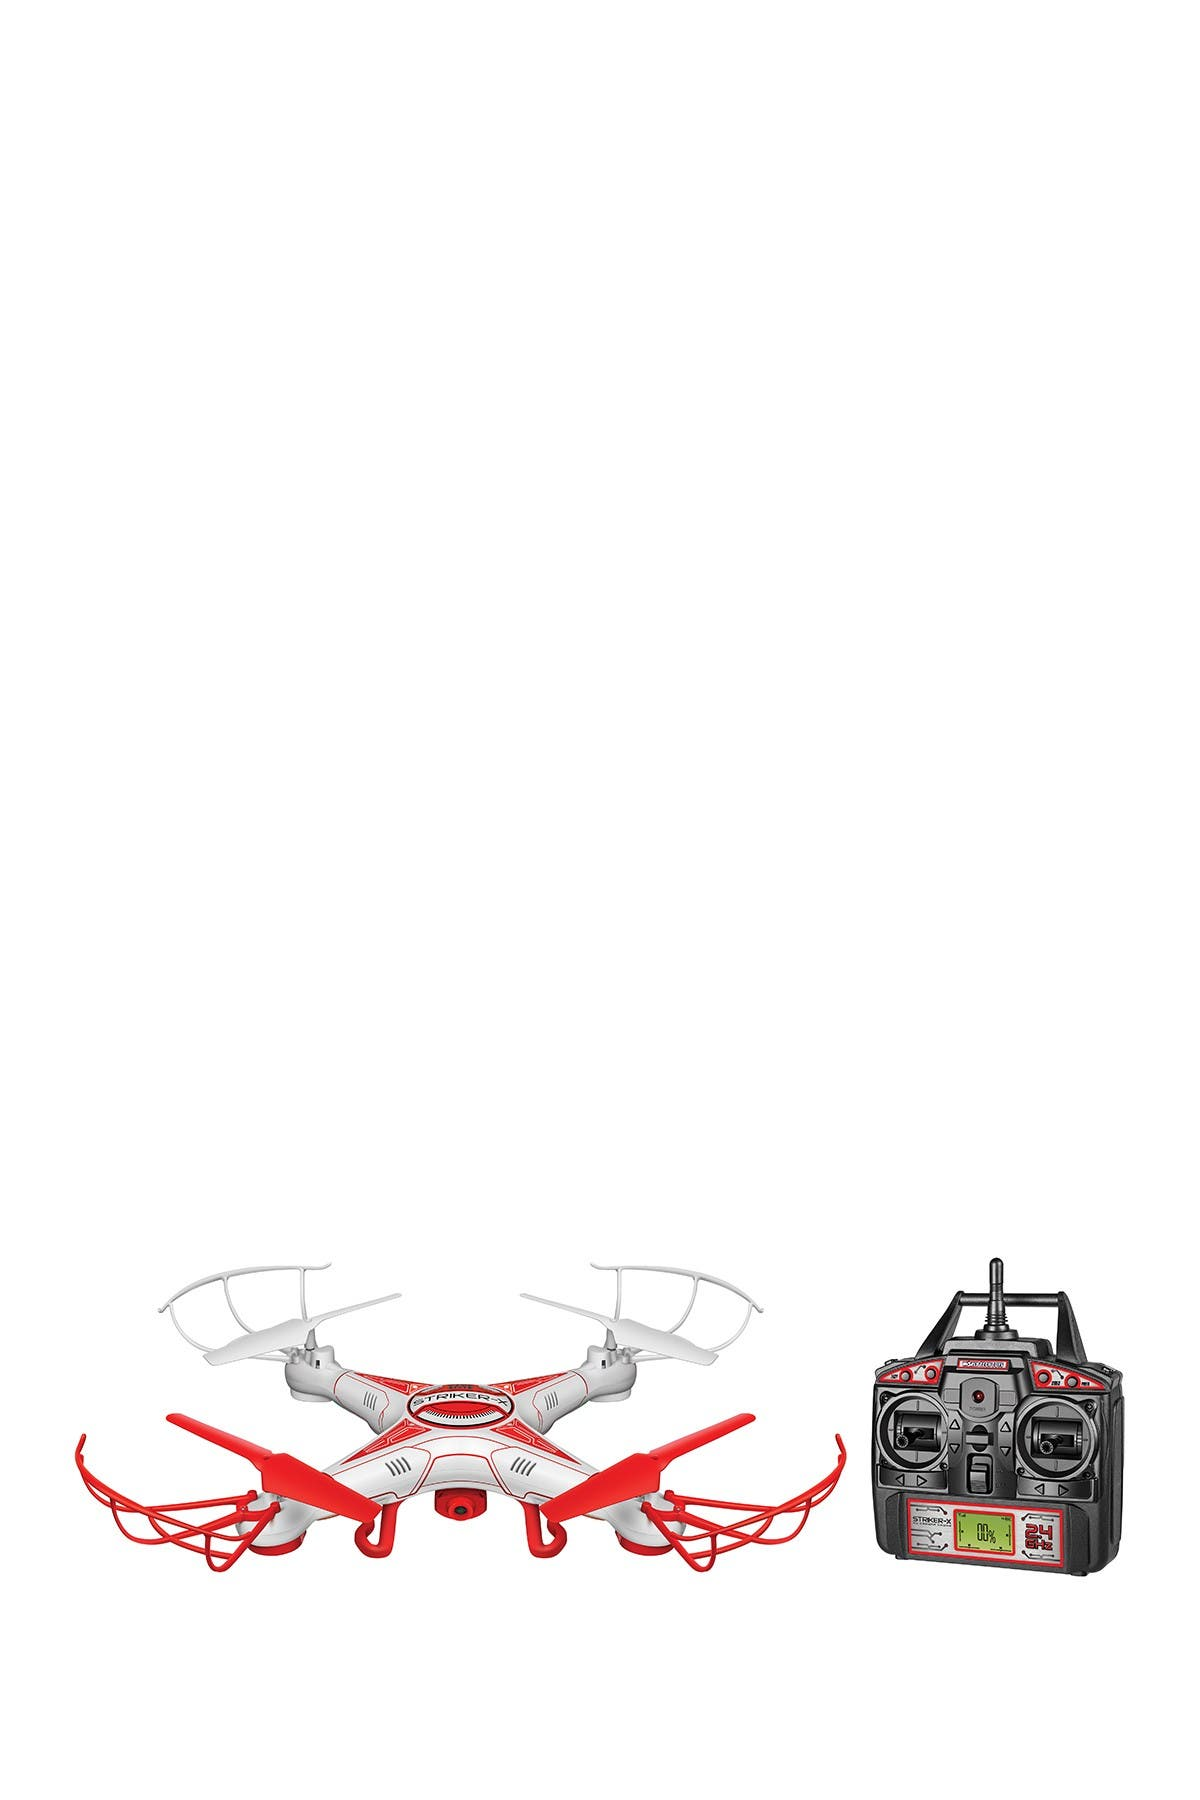 Image of World Tech Toys Striker-X 2.4GHz 4.5CH RC HD Camera Drone